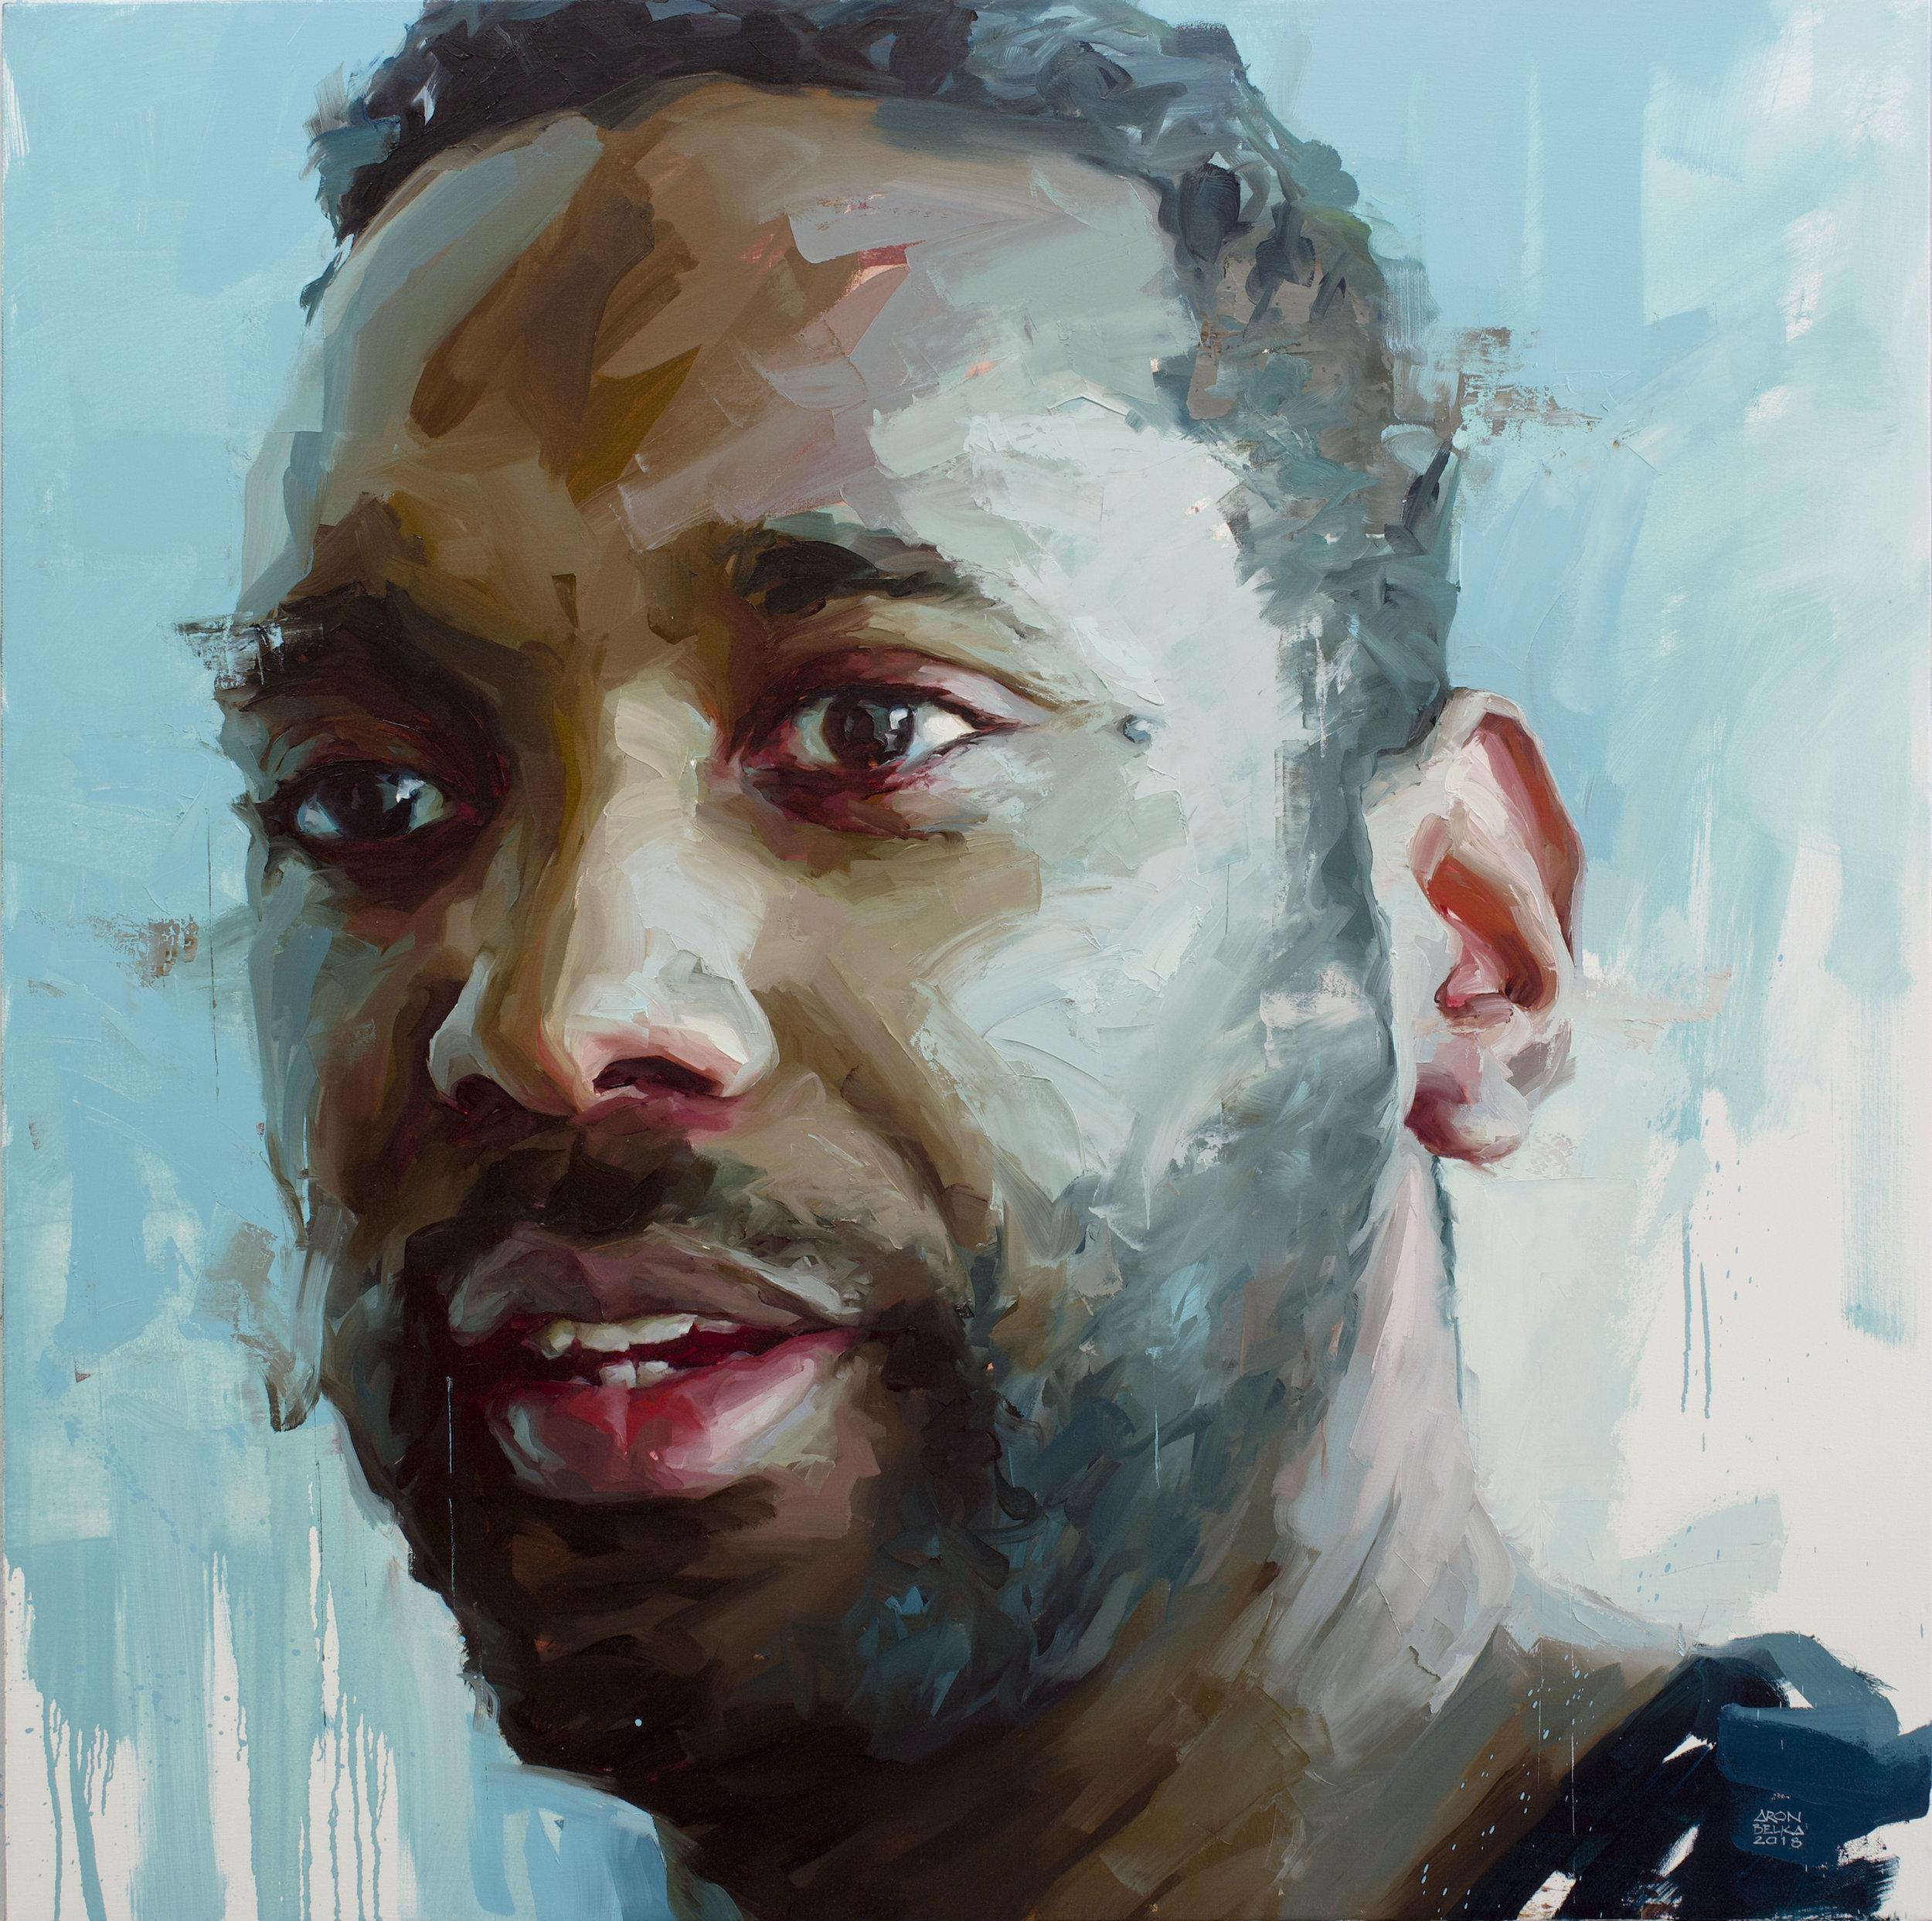 John Isiah Walton   2018 48 x 48 inches   oil on canvas